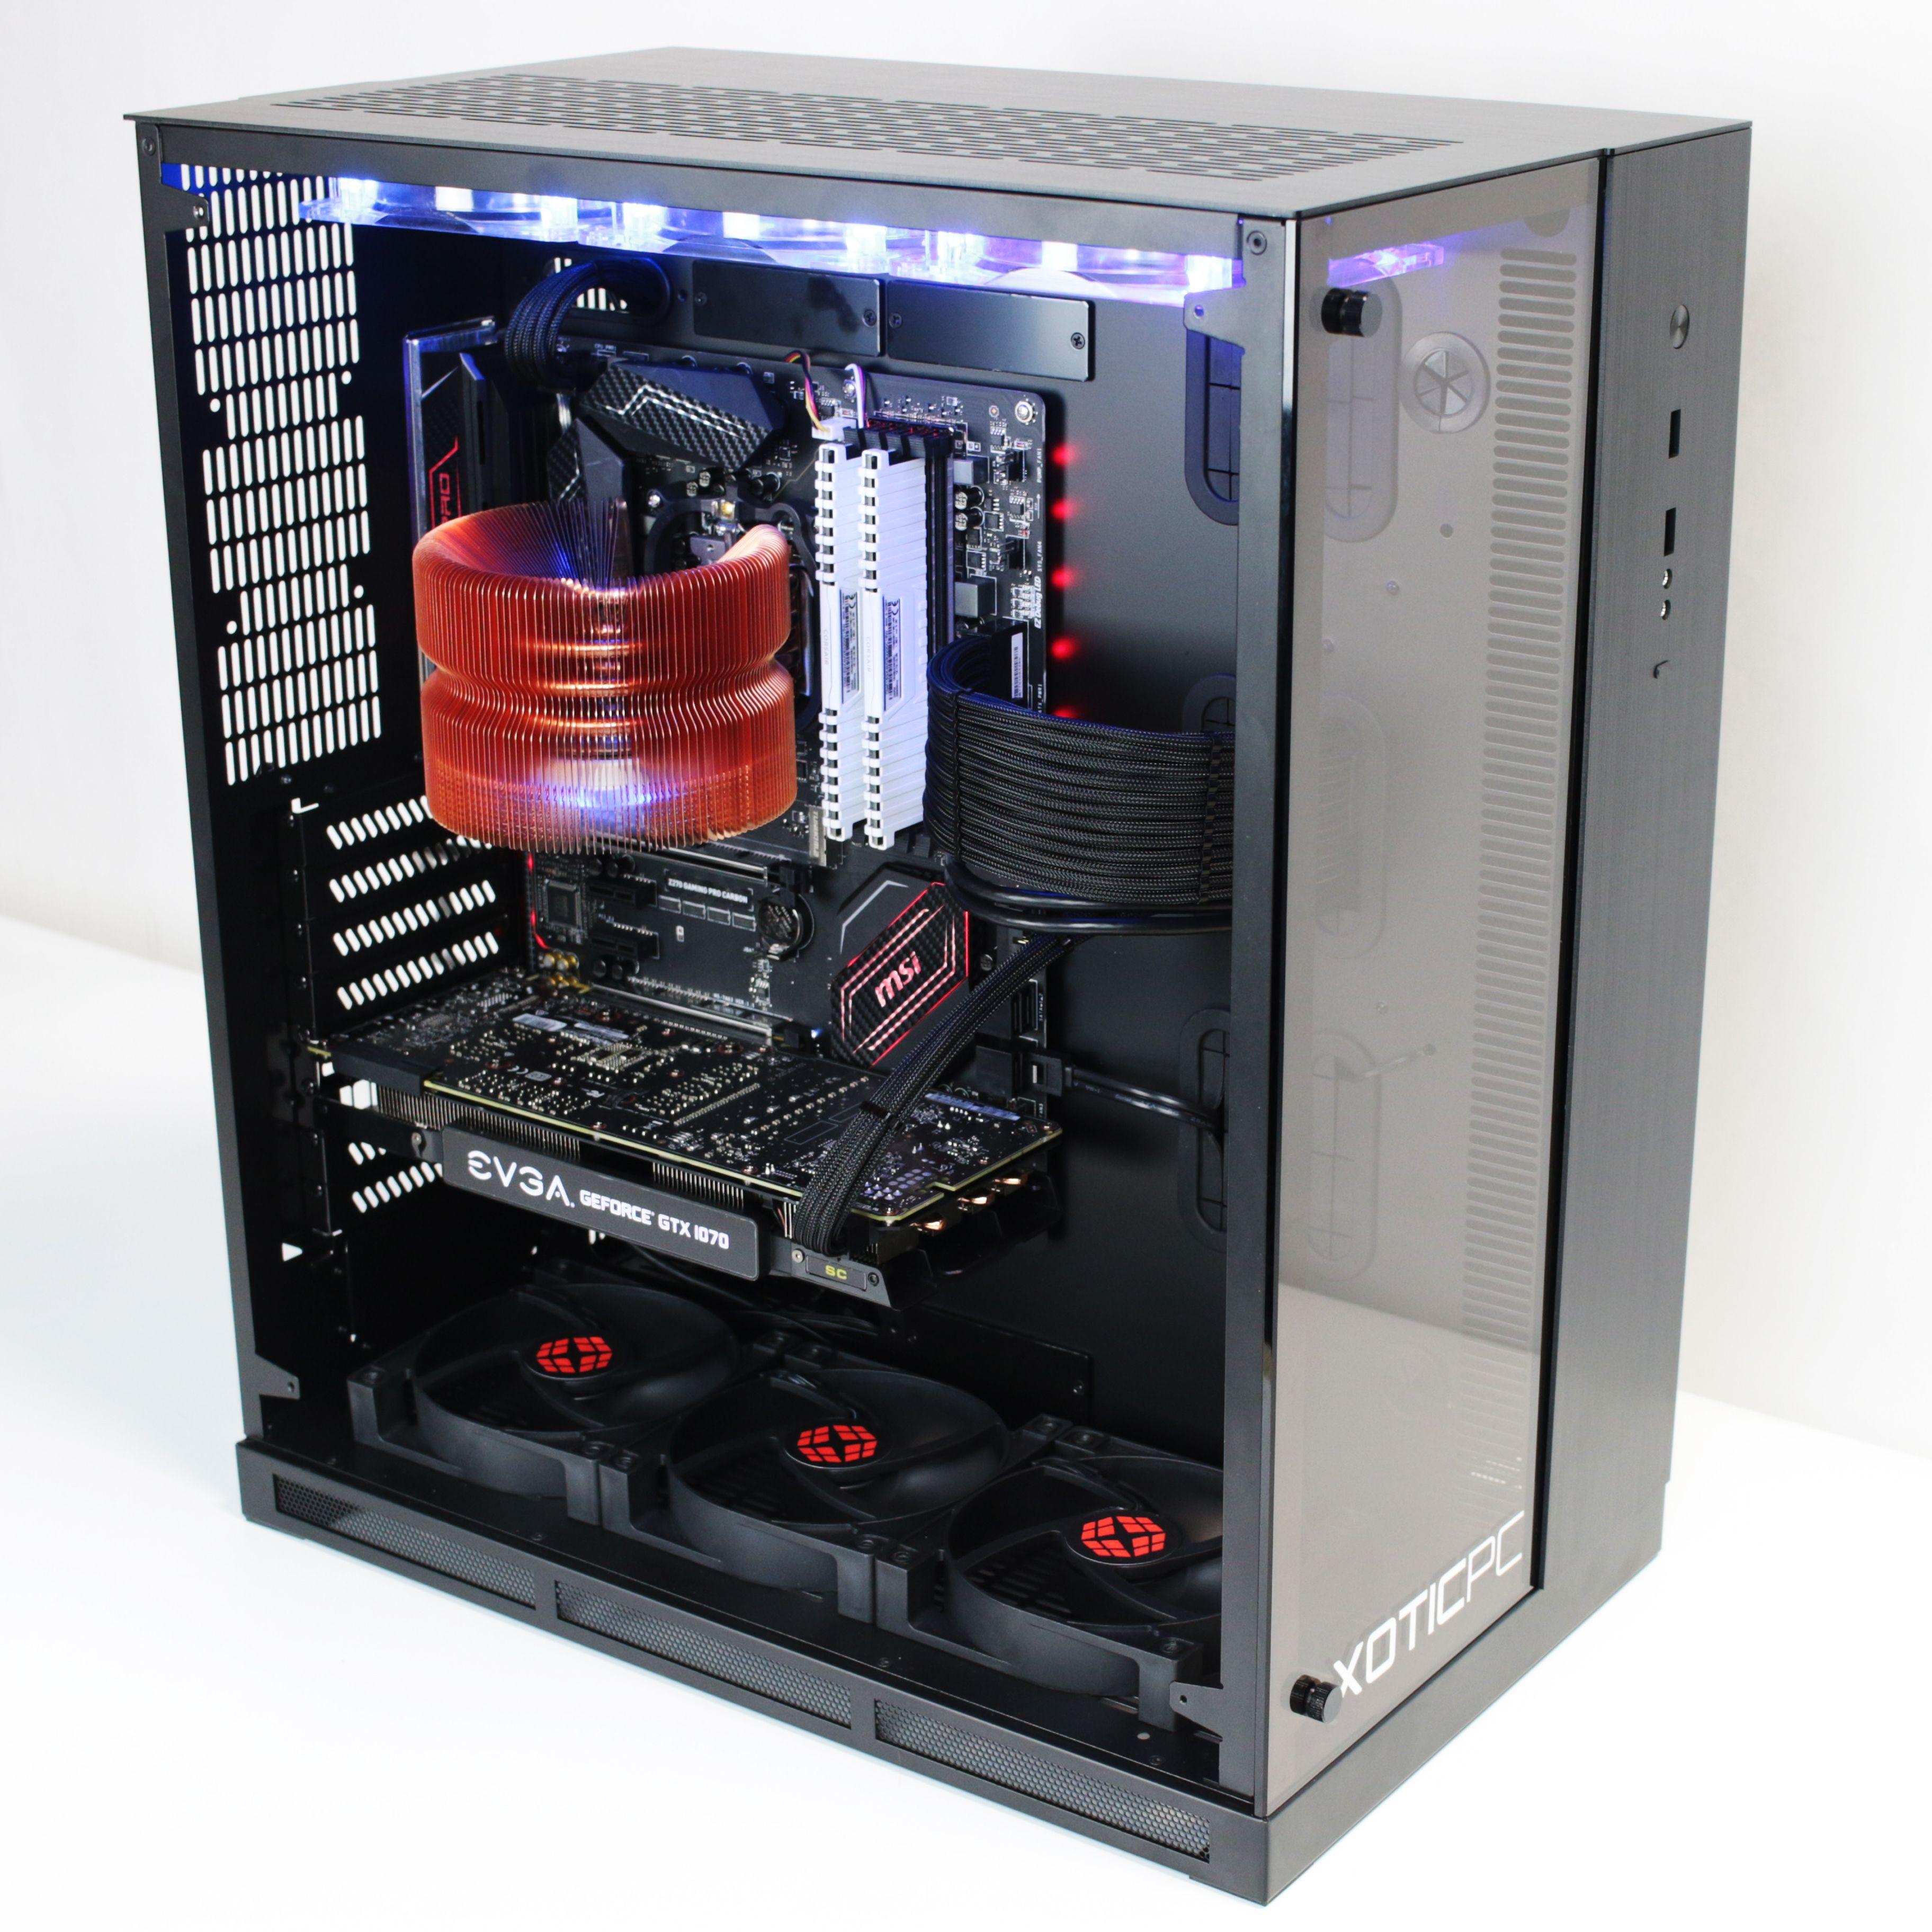 Gx11 Widow From Xotic Pc Custom Computer Custom Pc Gaming Room Setup